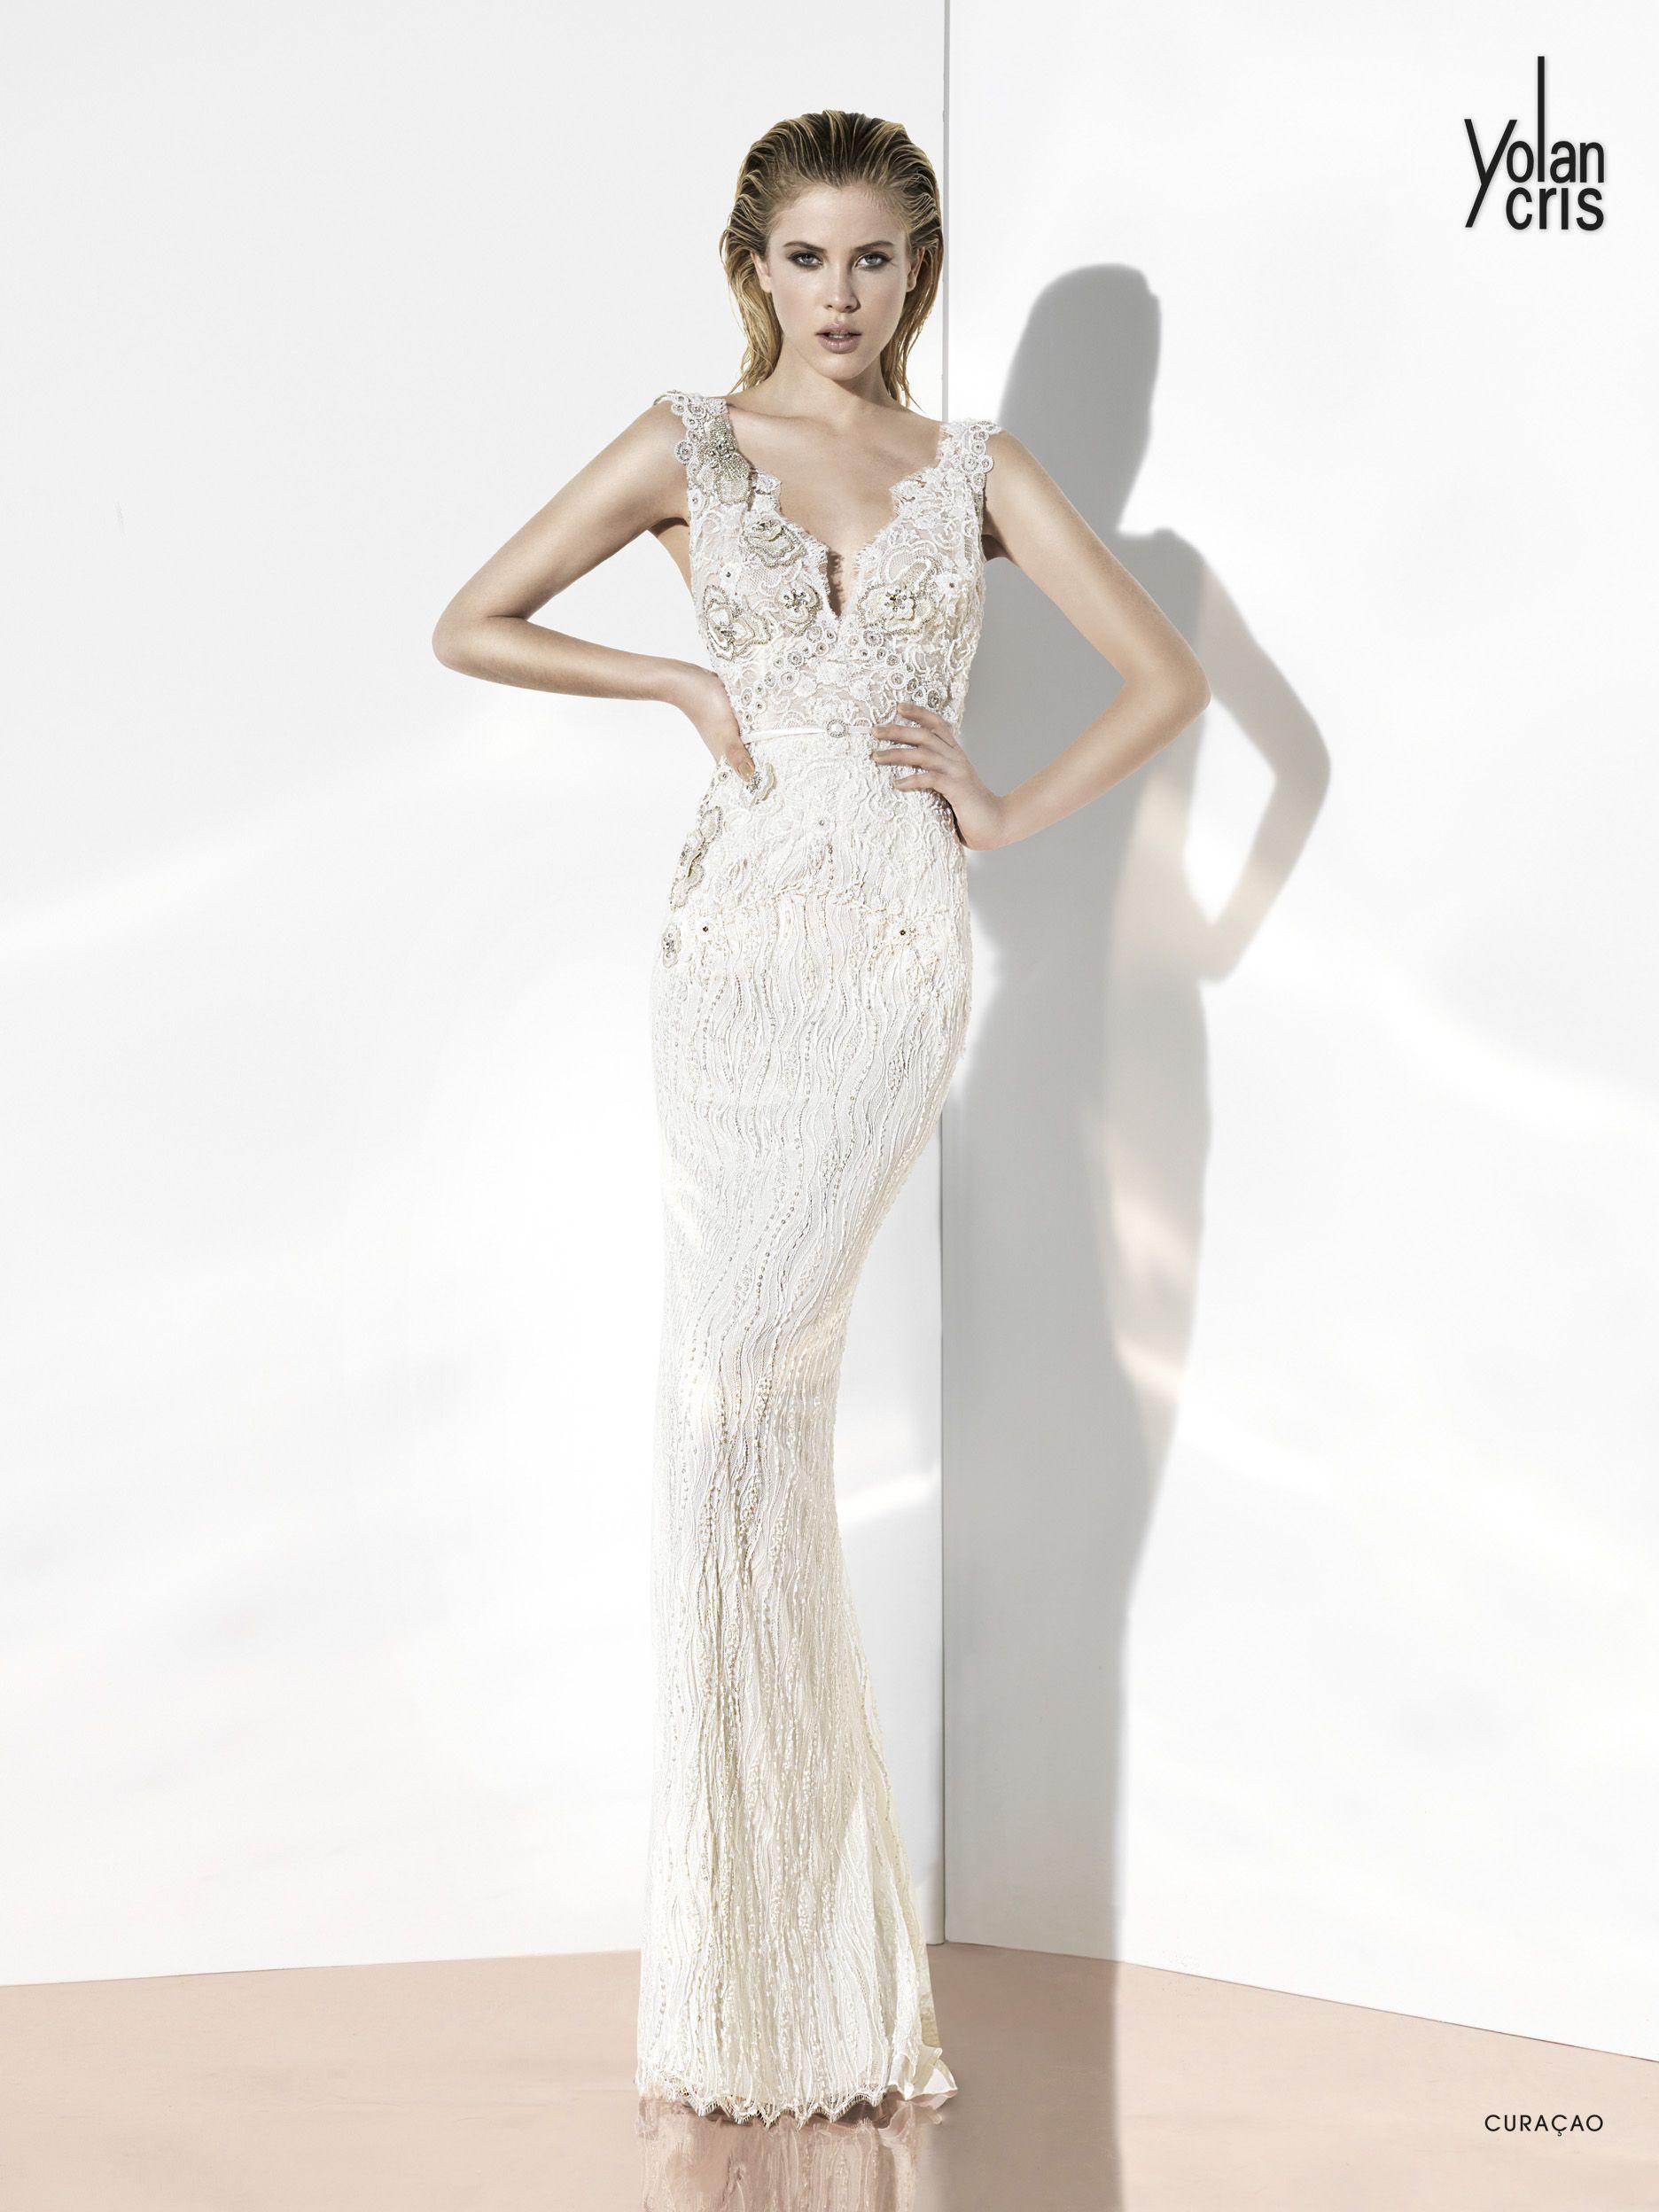 Fabulous gown from Yolan Cris at Nouvelle vogue boutique!